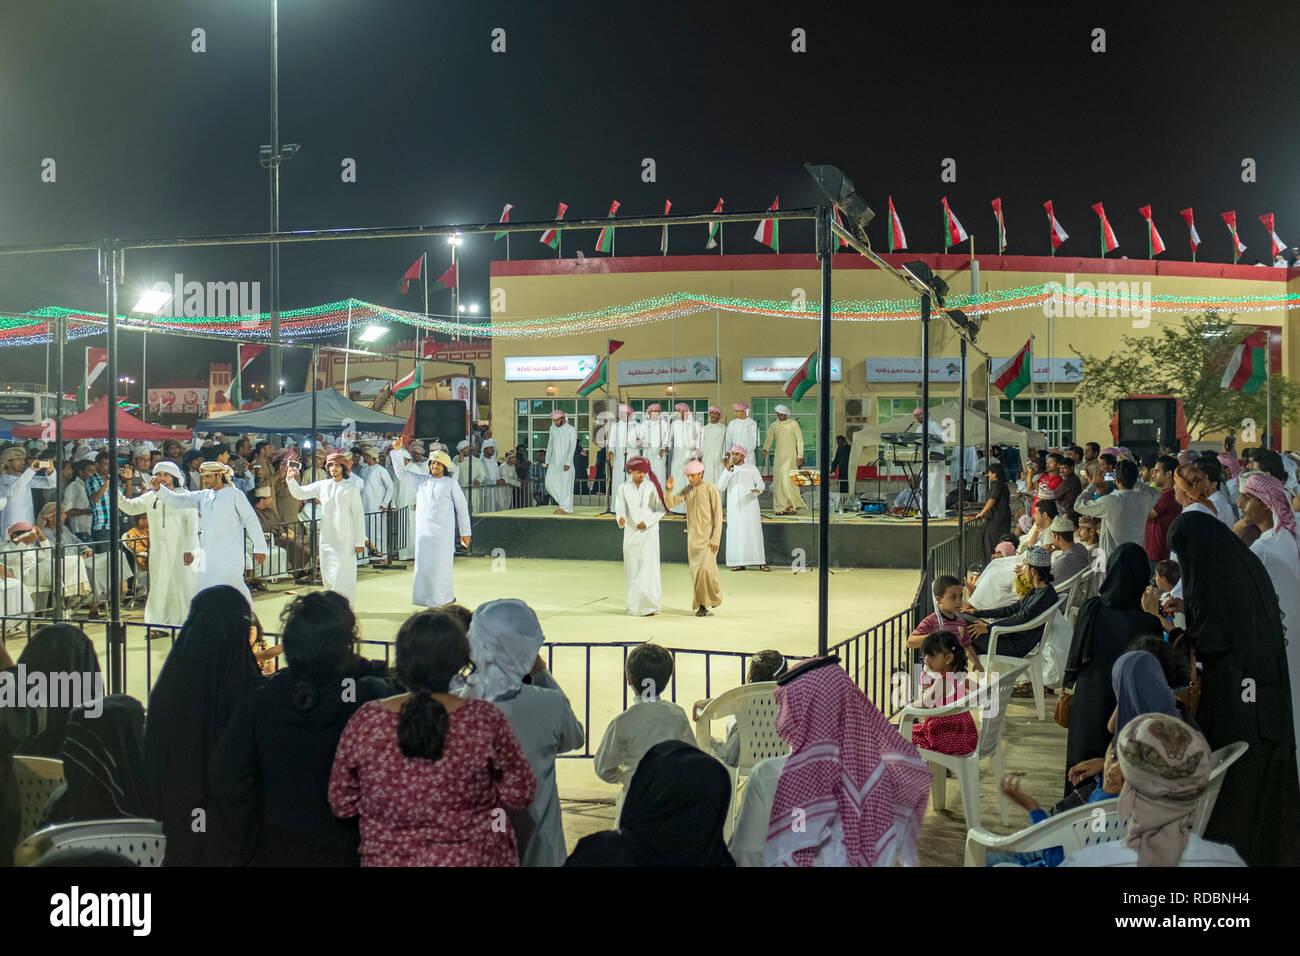 Omani Boys Stock Photos & Omani Boys Stock Images - Alamy